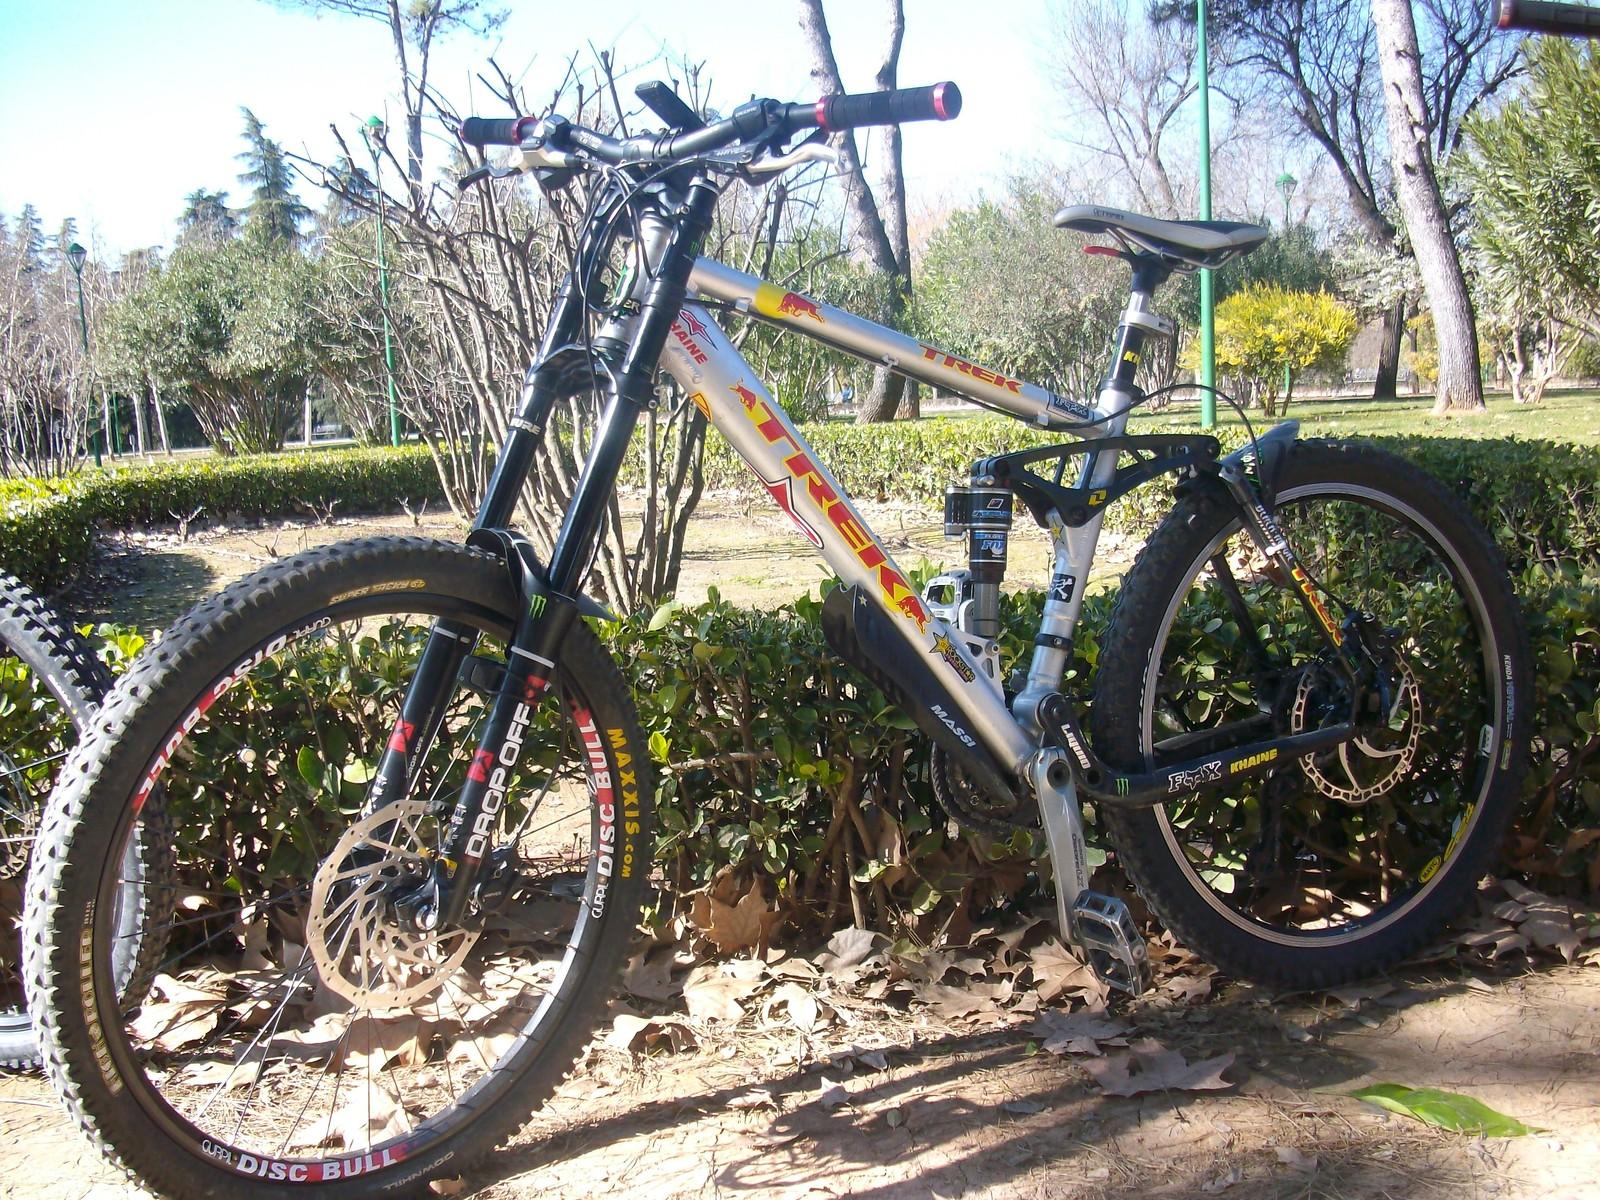 trek liquid - Jose Funes khaine - Mountain Biking Pictures - Vital MTB